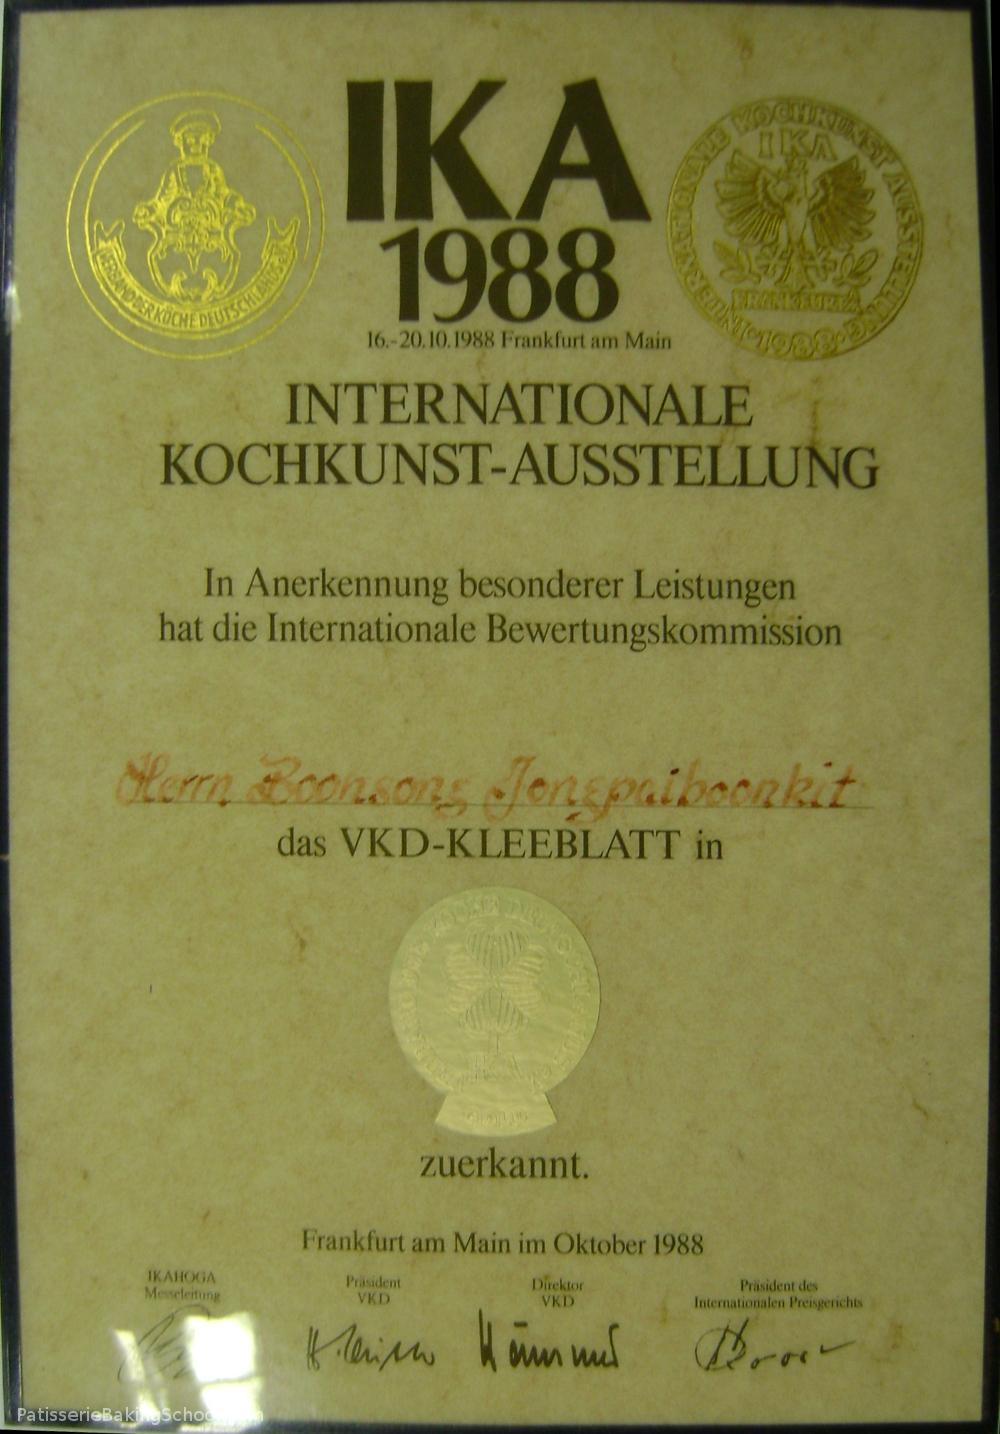 IKA 1998